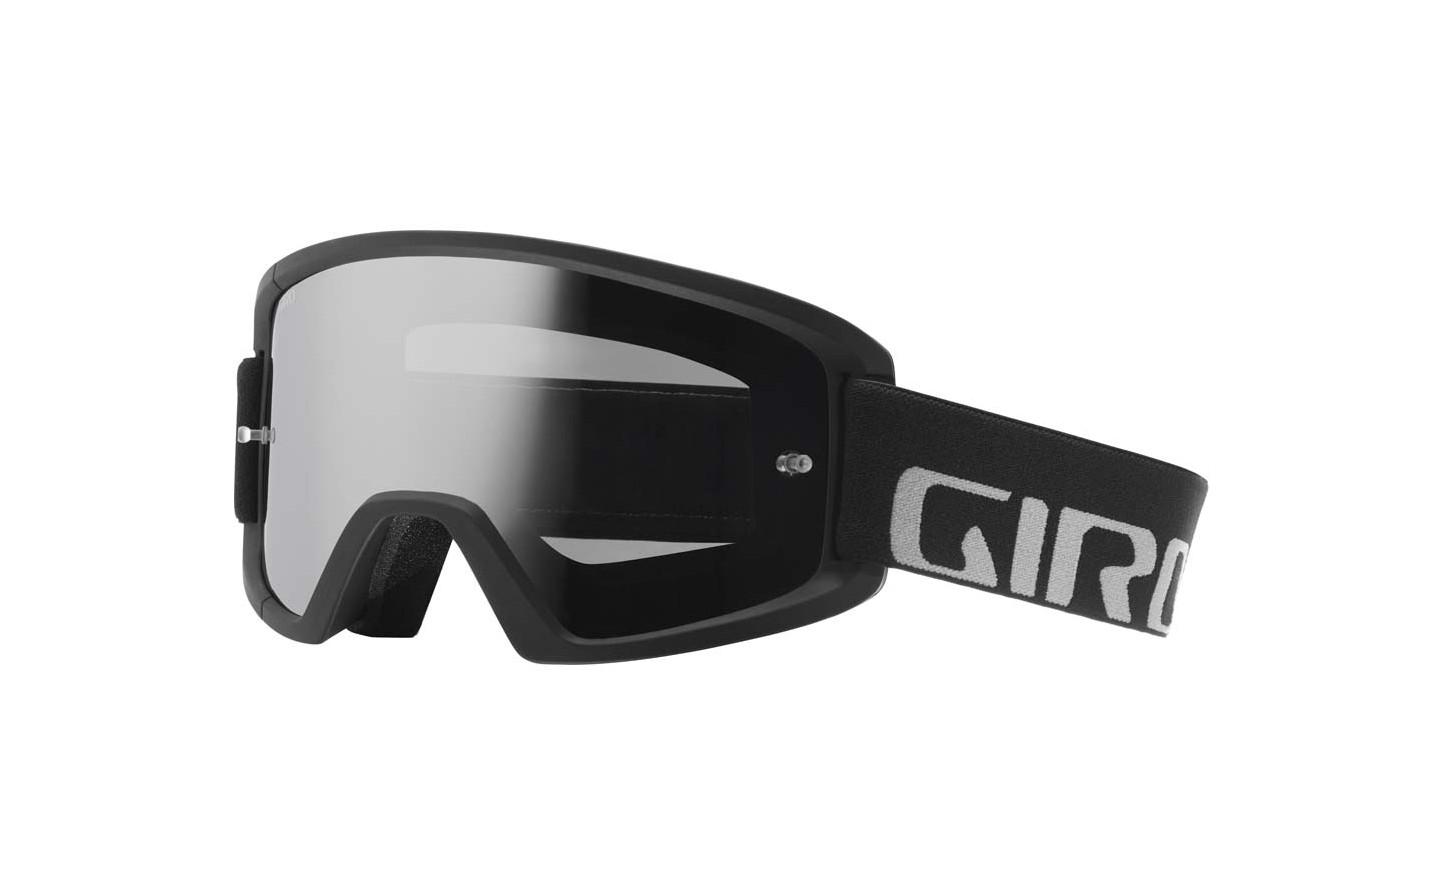 2aff49741d Gafas Giro TAZZ Negro/Gris - Fabregues Bicicletas